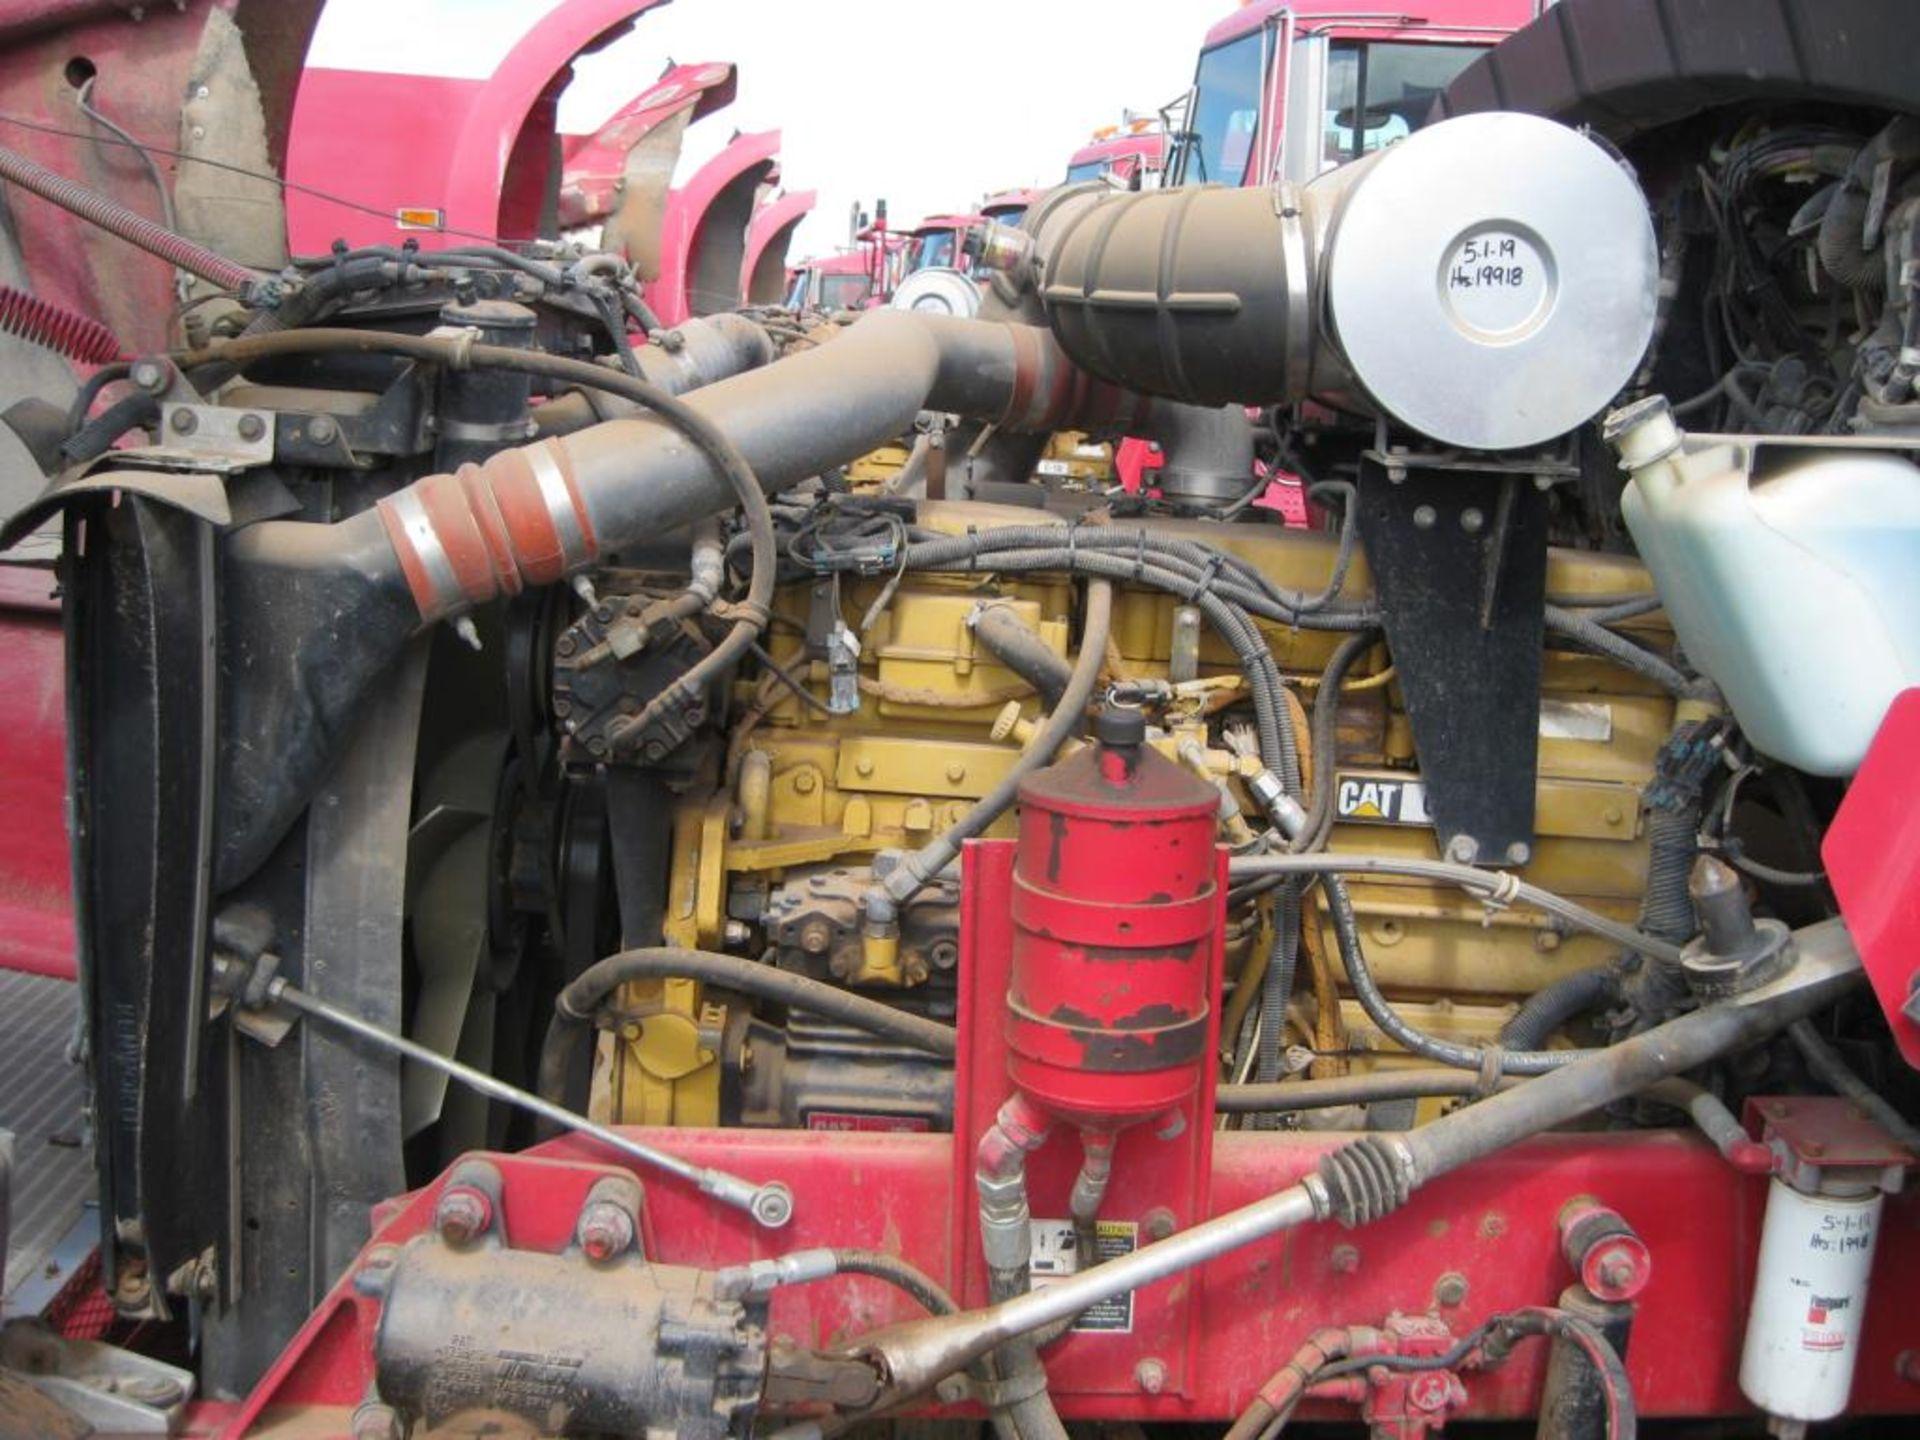 Kenworth Truck - Image 19 of 20